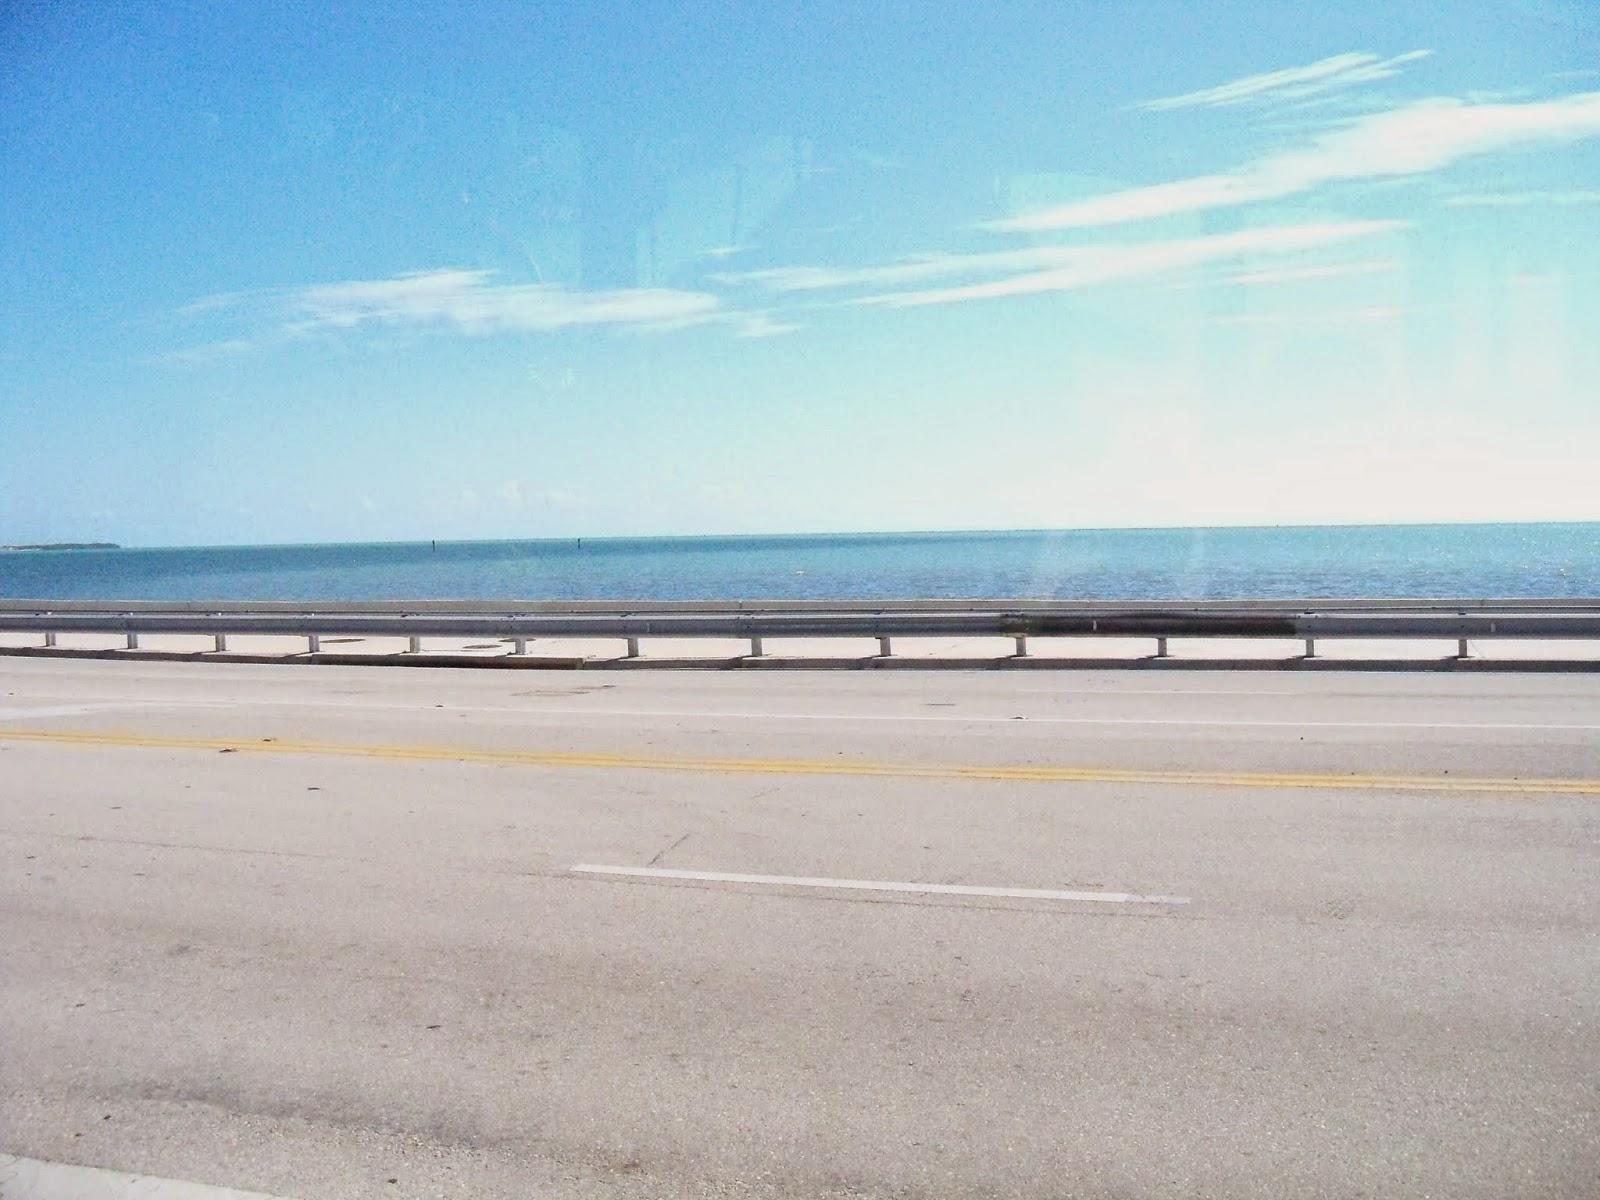 Key West Vacation - 116_5792.JPG